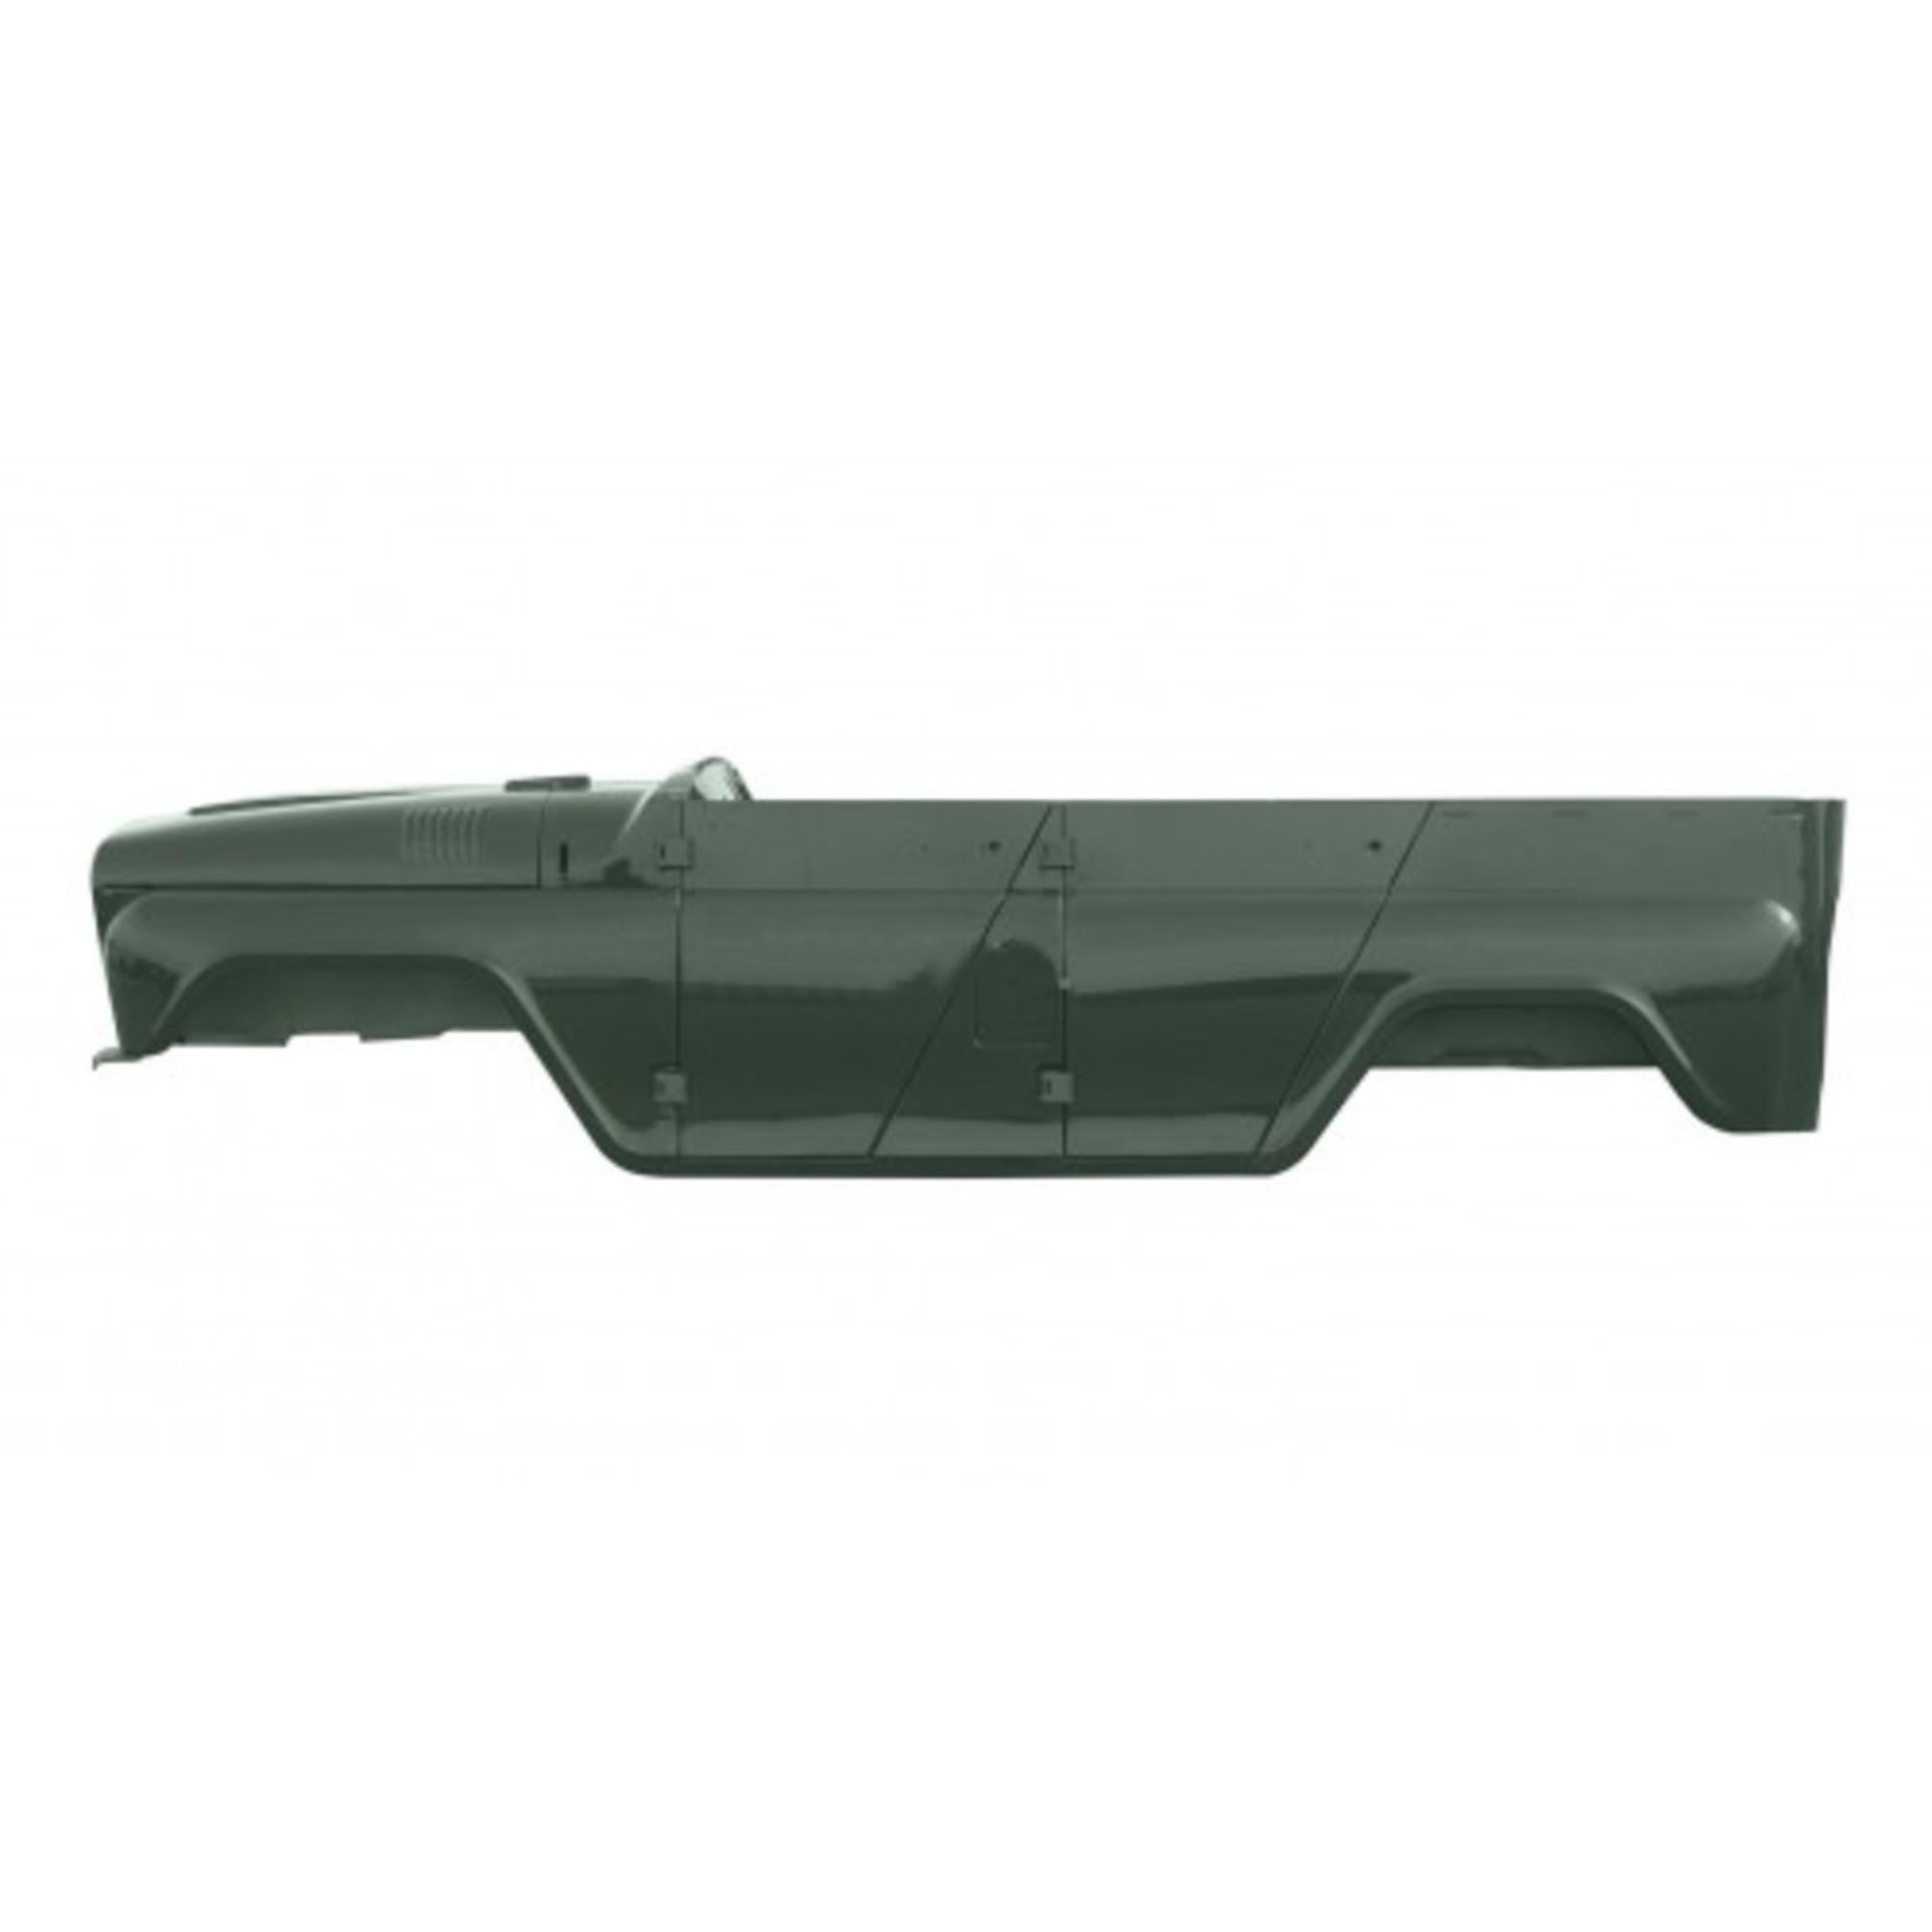 Каркас кузова УАЗ-31514 (легковой под крышу) ХАКИ